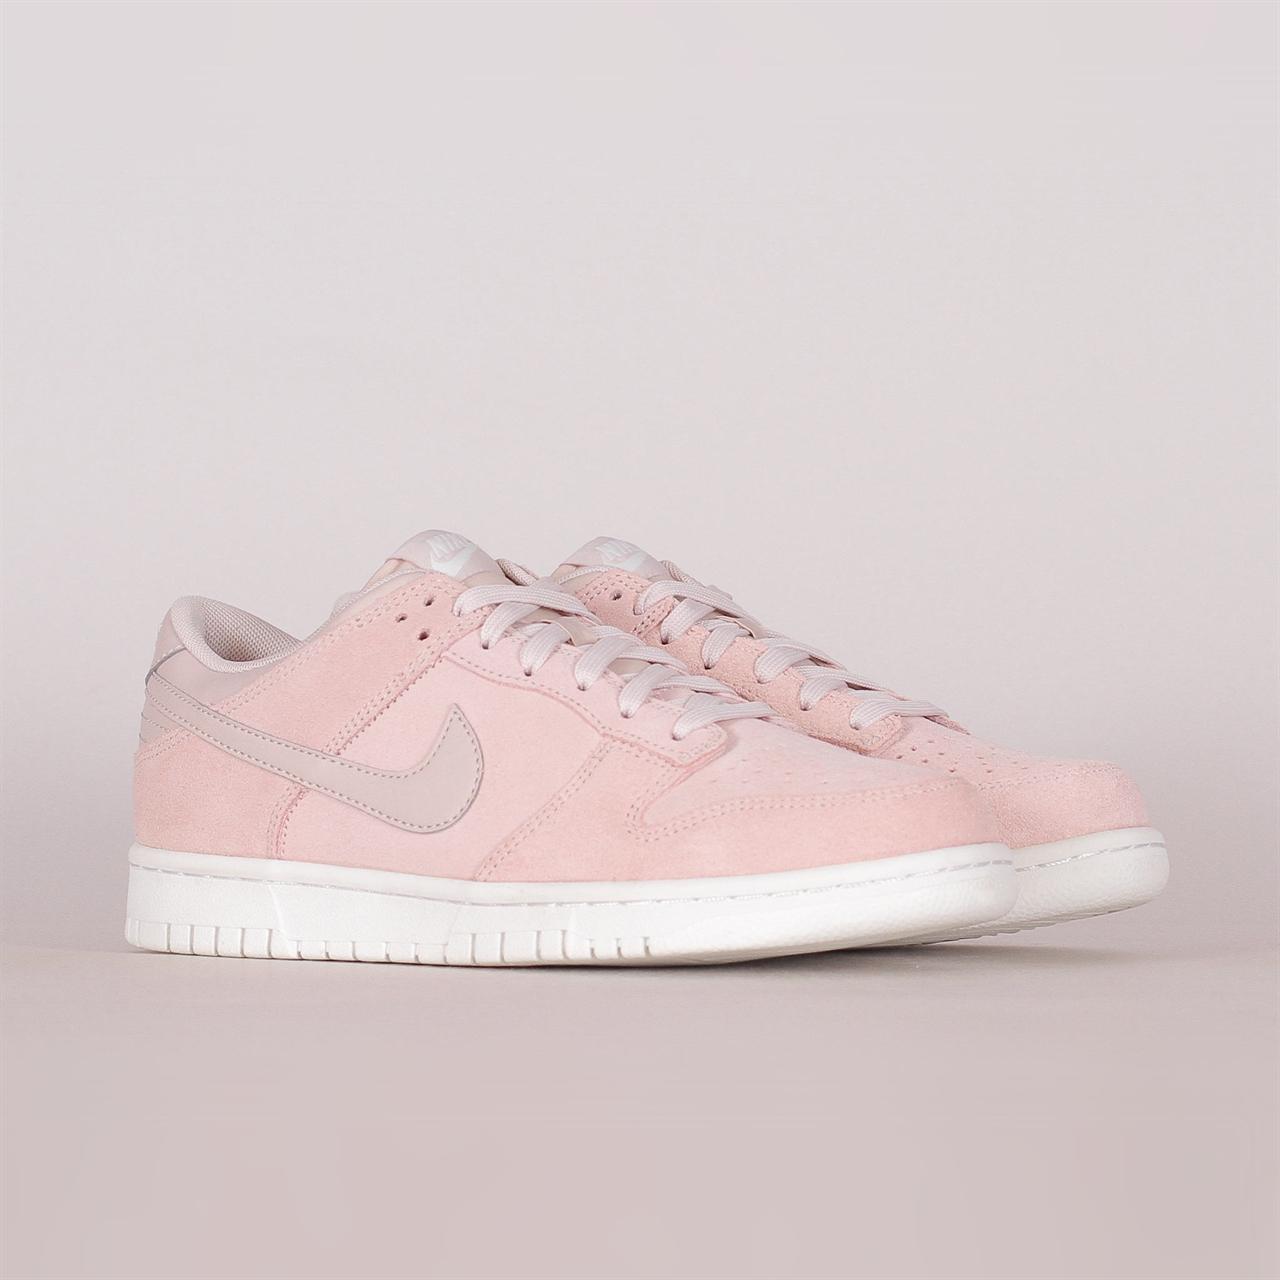 77a4d69c6922e Shelta - Nike Sportswear Dunk Low (904234-603)